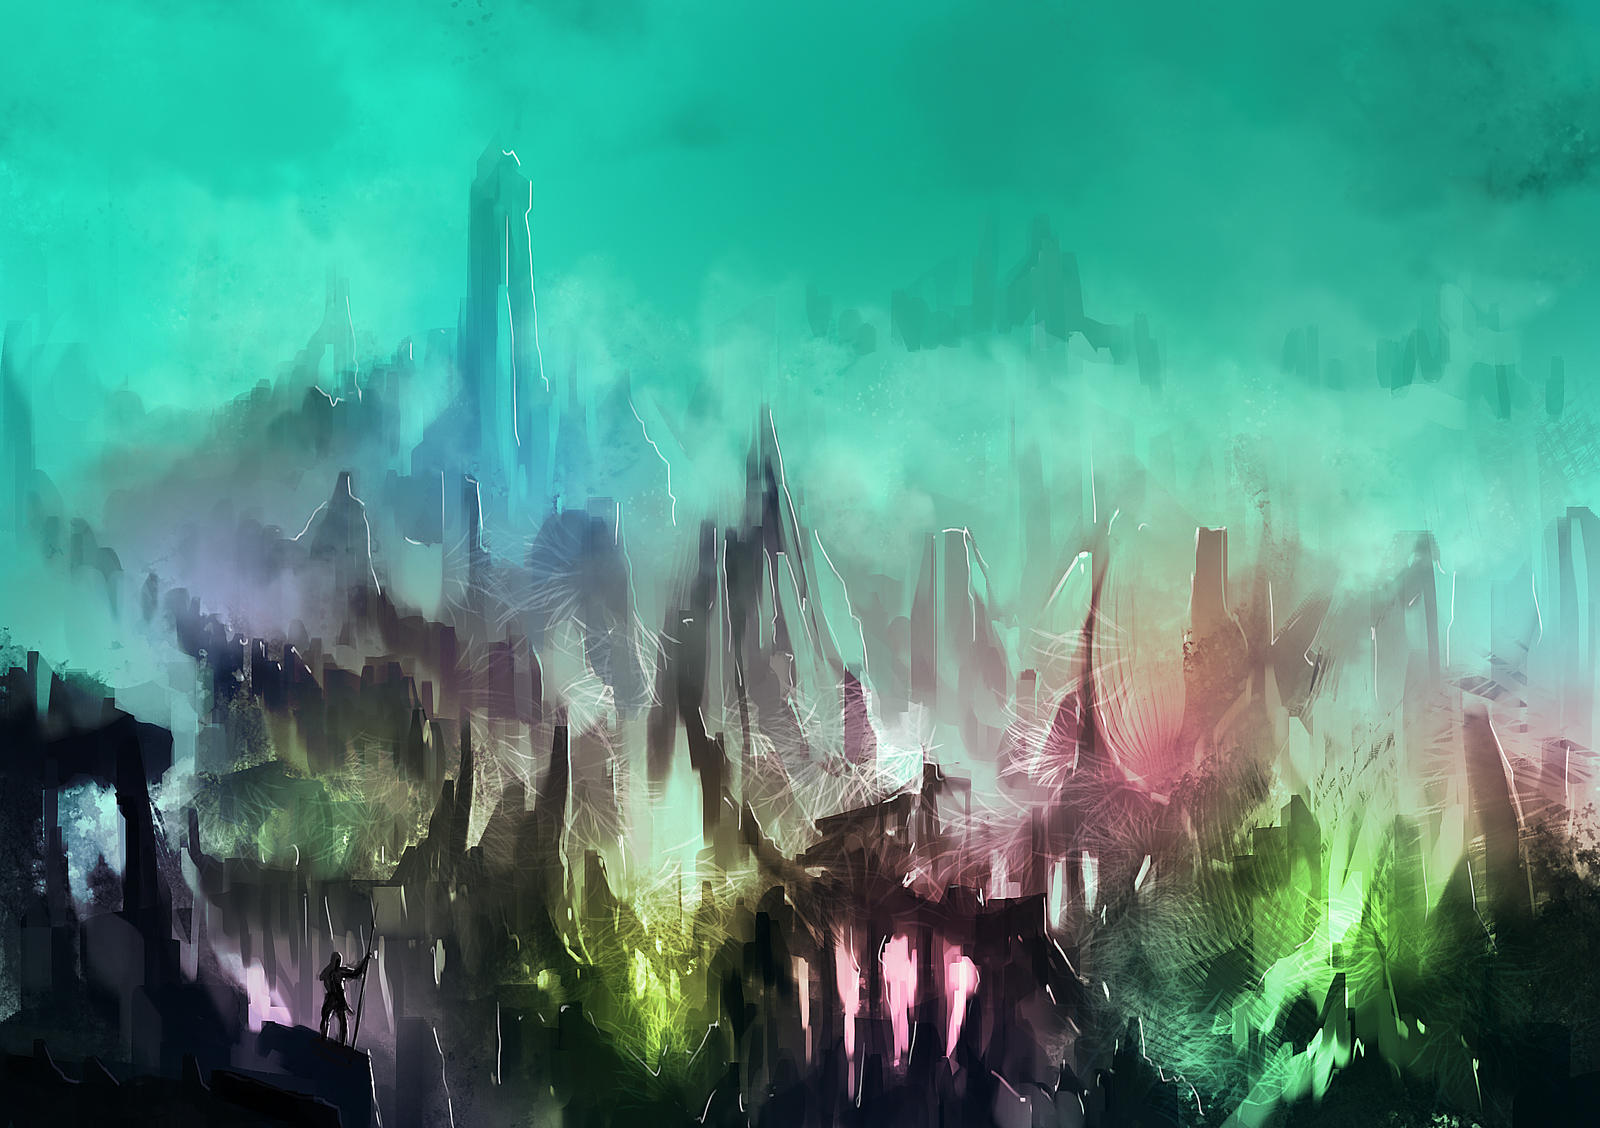 Crystal valley by vladgheneli